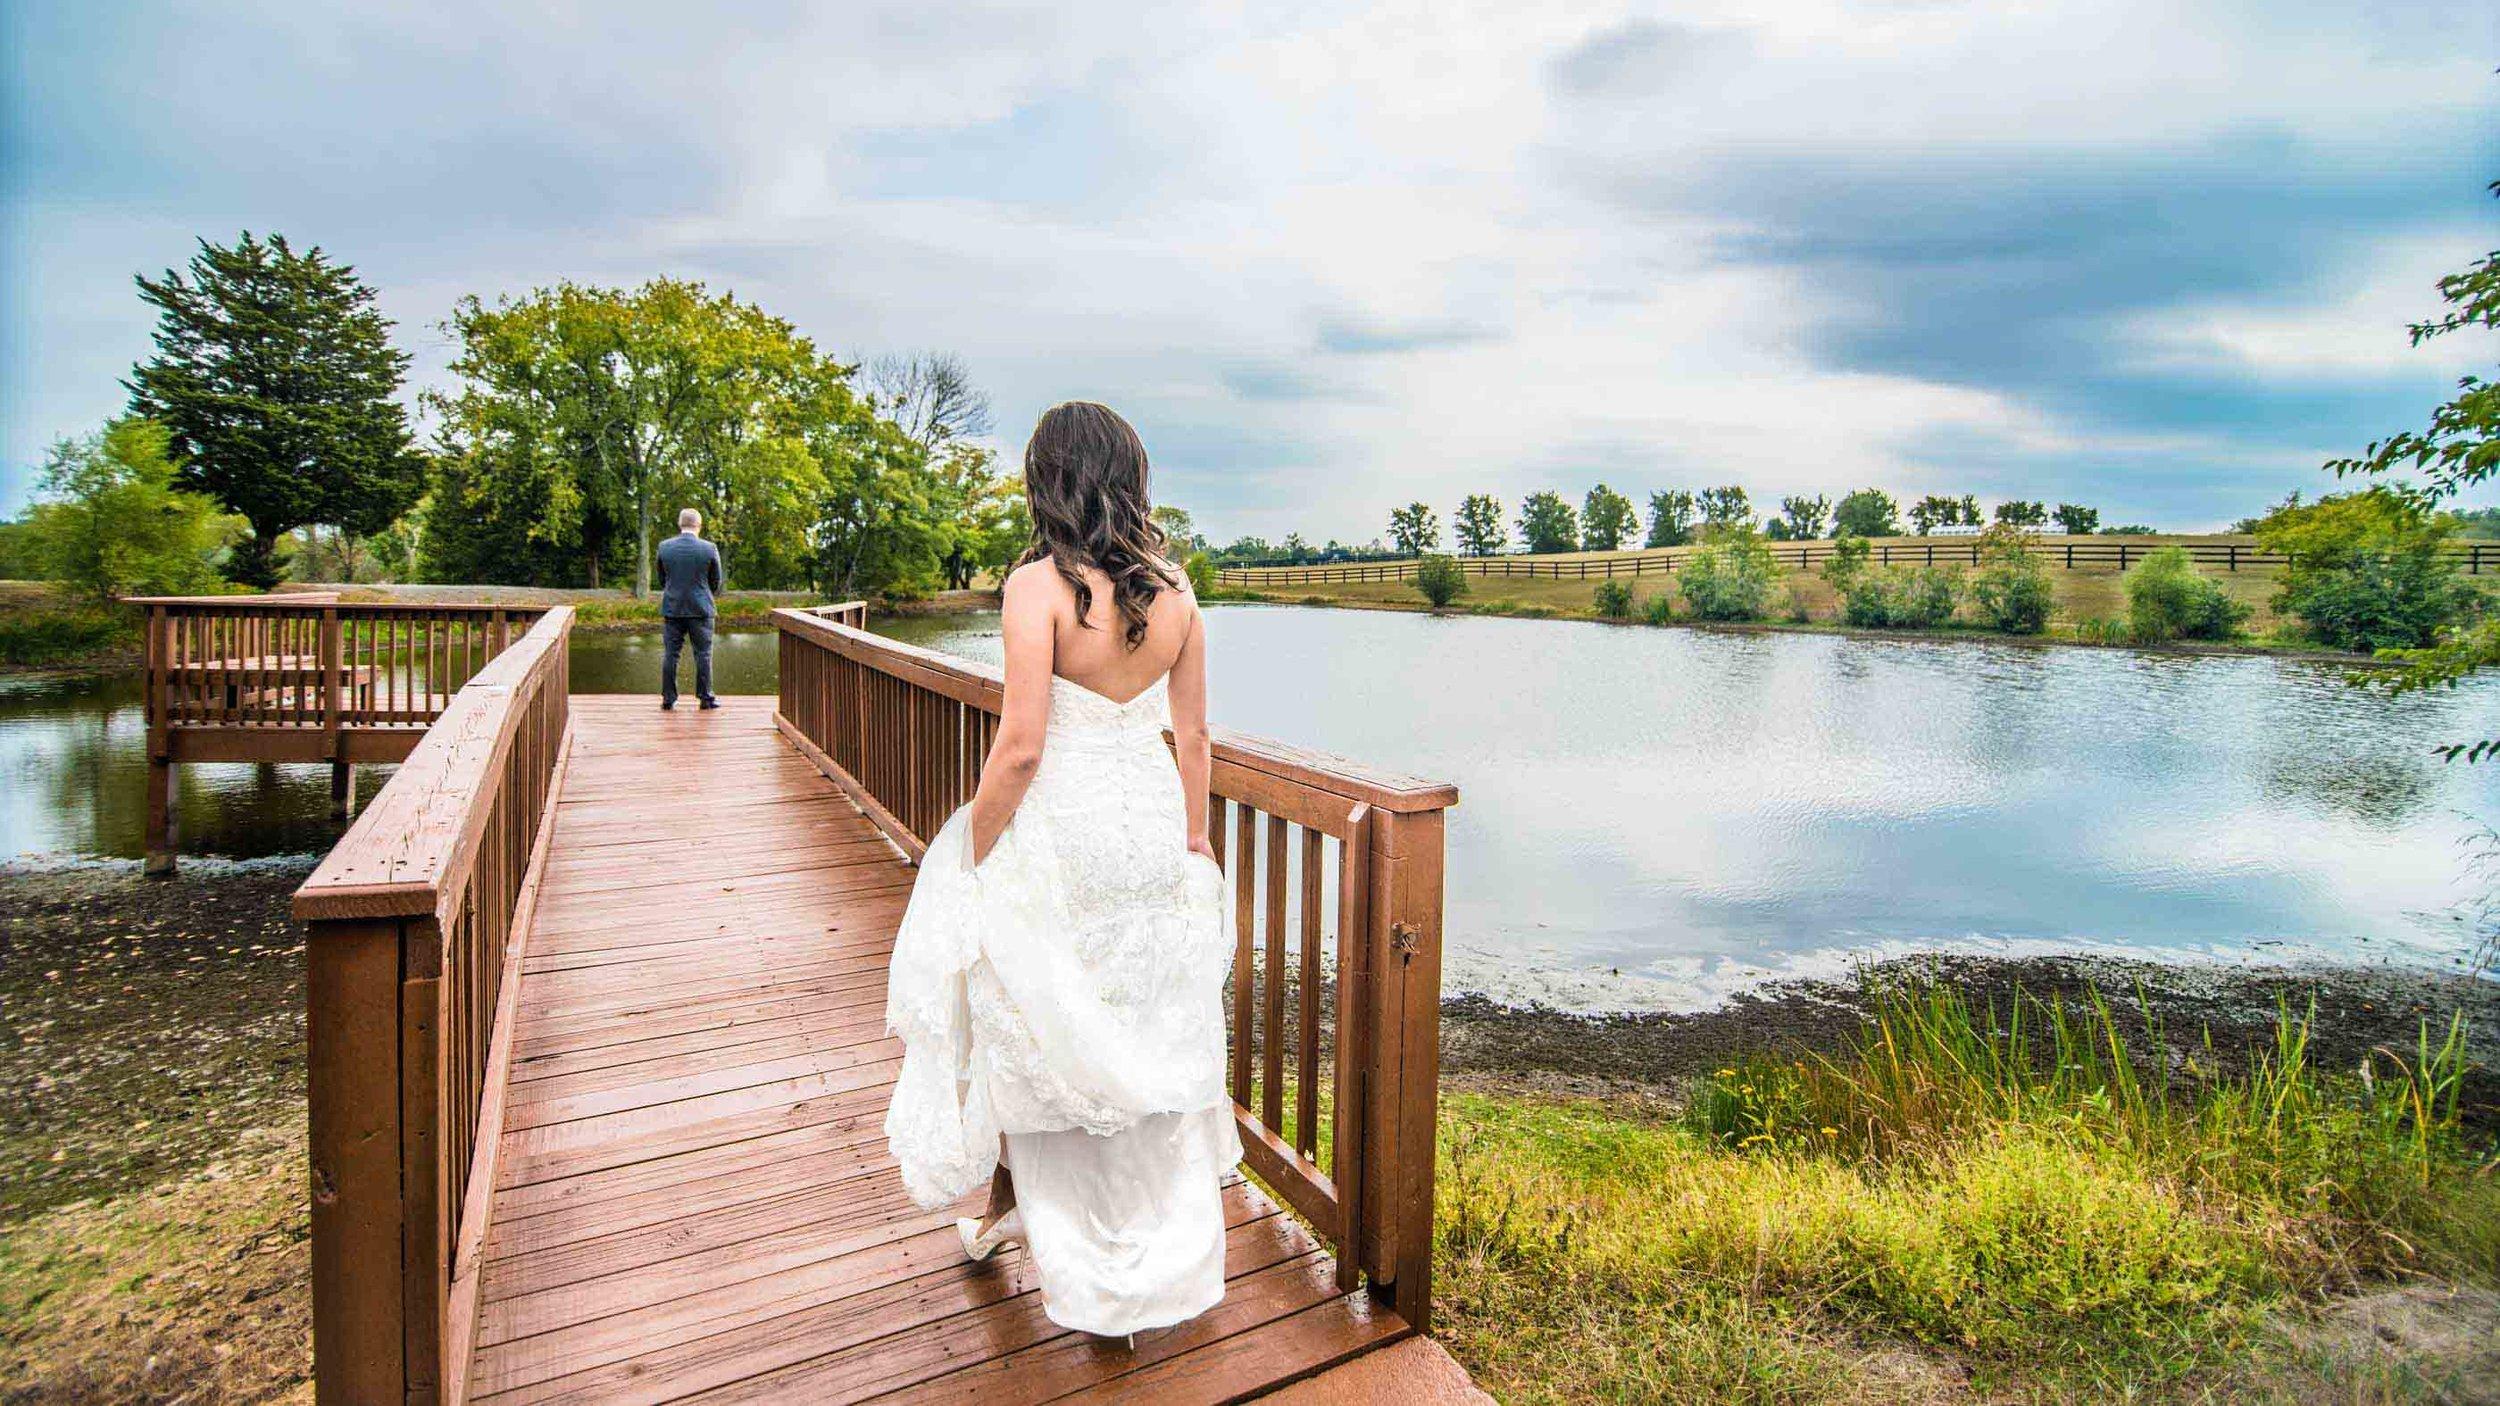 dc+metro+wedding+photography+vadym+guliuk-2724-2-1-28.jpg